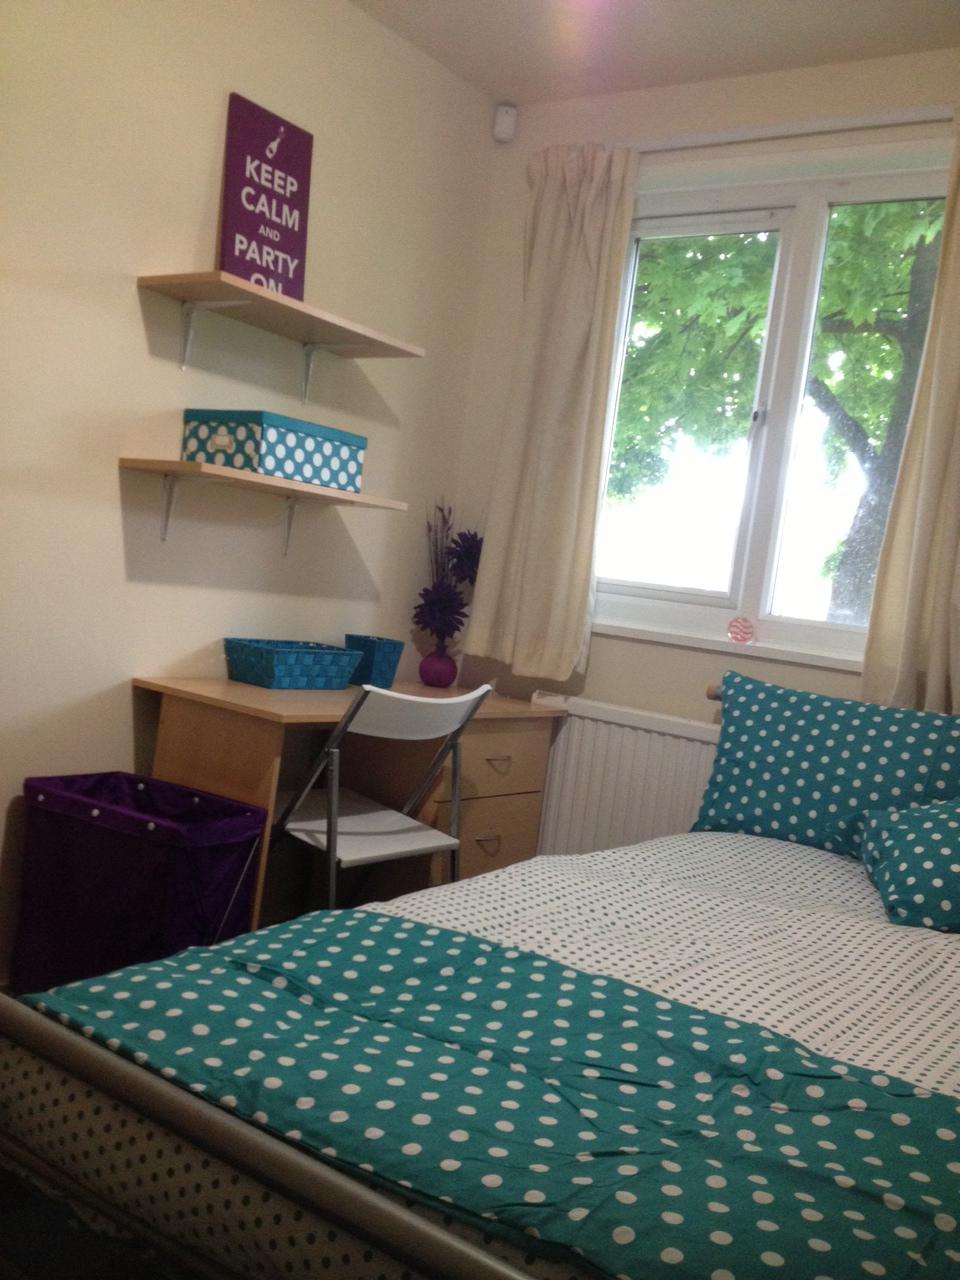 Each bedroom have, either built-in desks or freestanding desks, all with comfortable large beds, wardrobes and shelves.